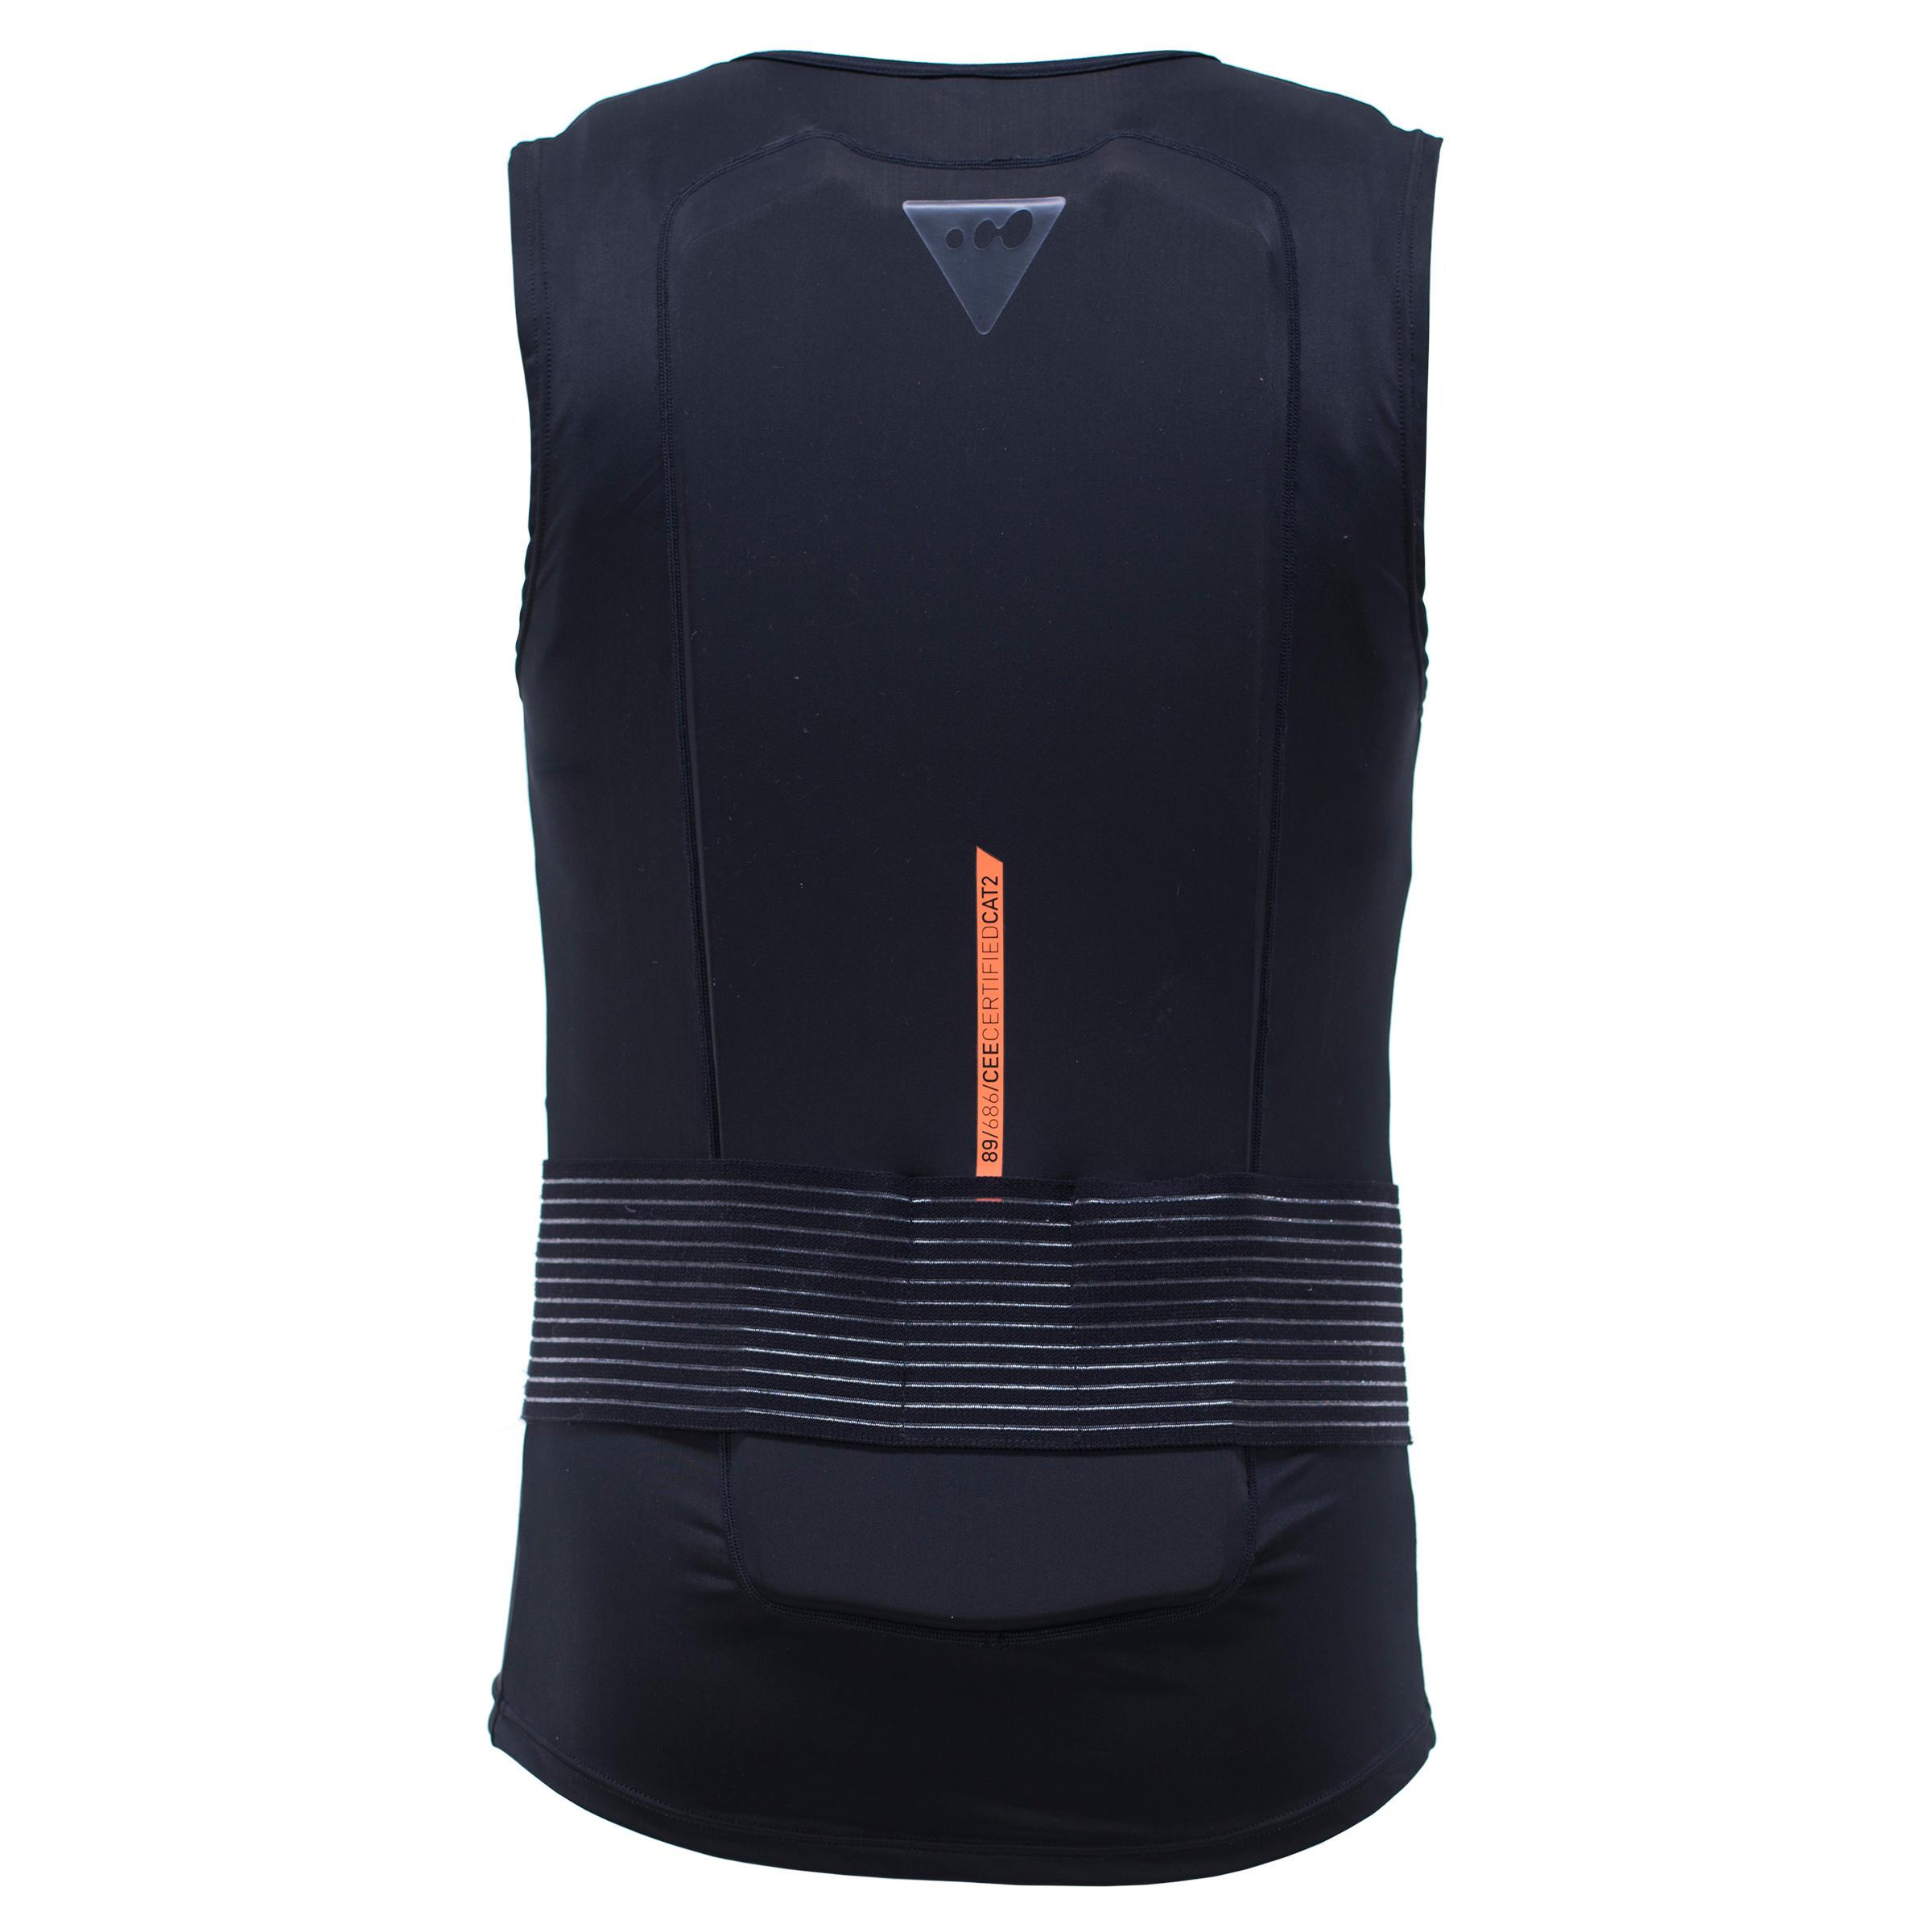 Gilet protection dorsale de ski et snowboard adulte dbck 100 noir wedze